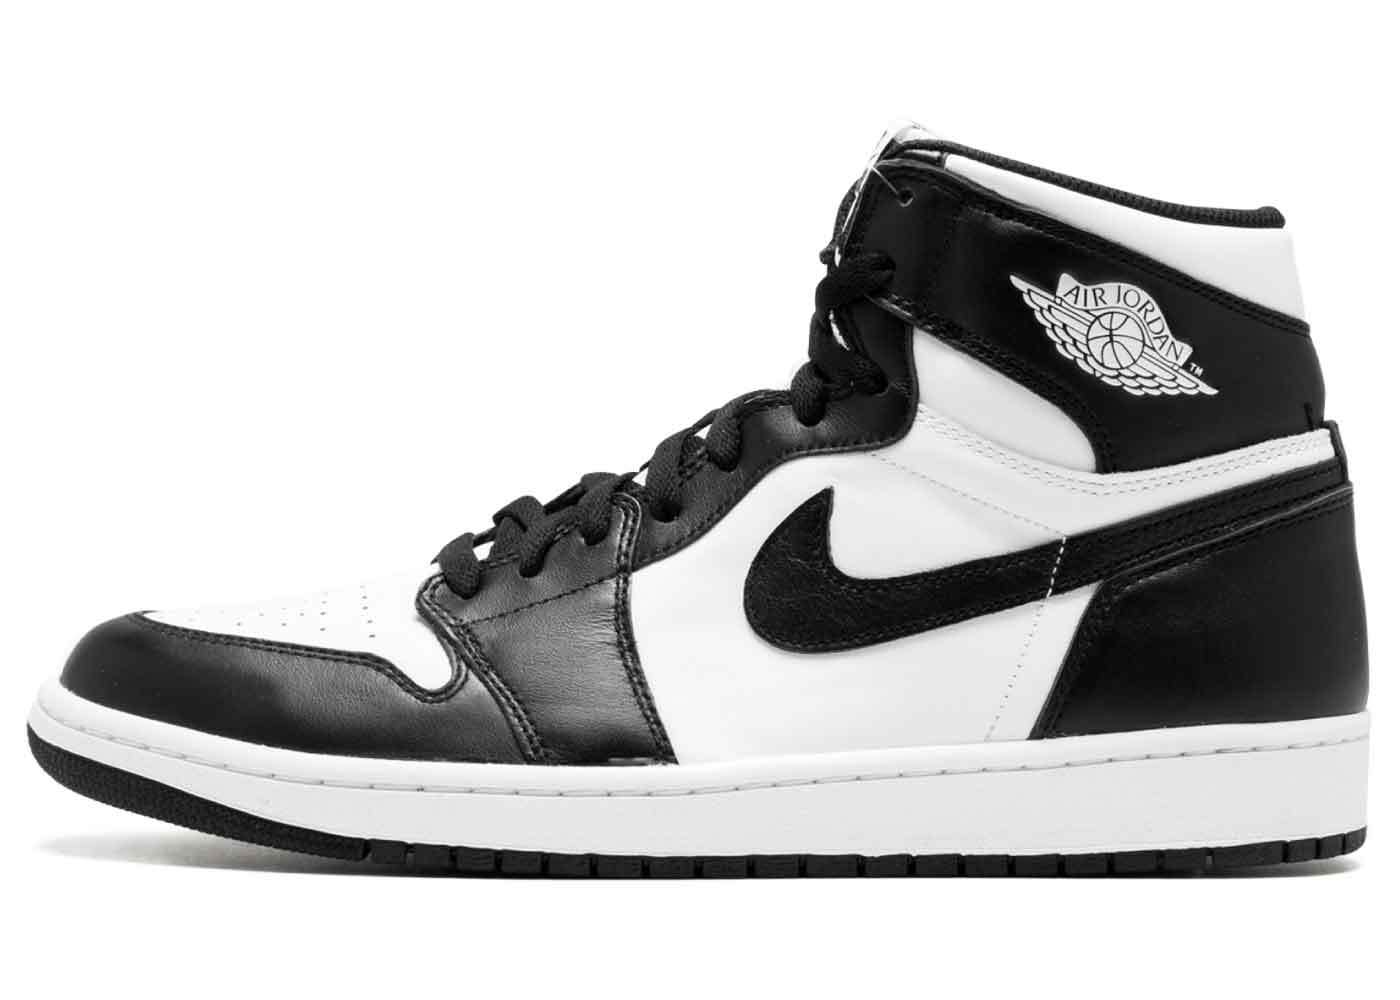 Nike Air Jordan 1 Retro Black Whiteの写真